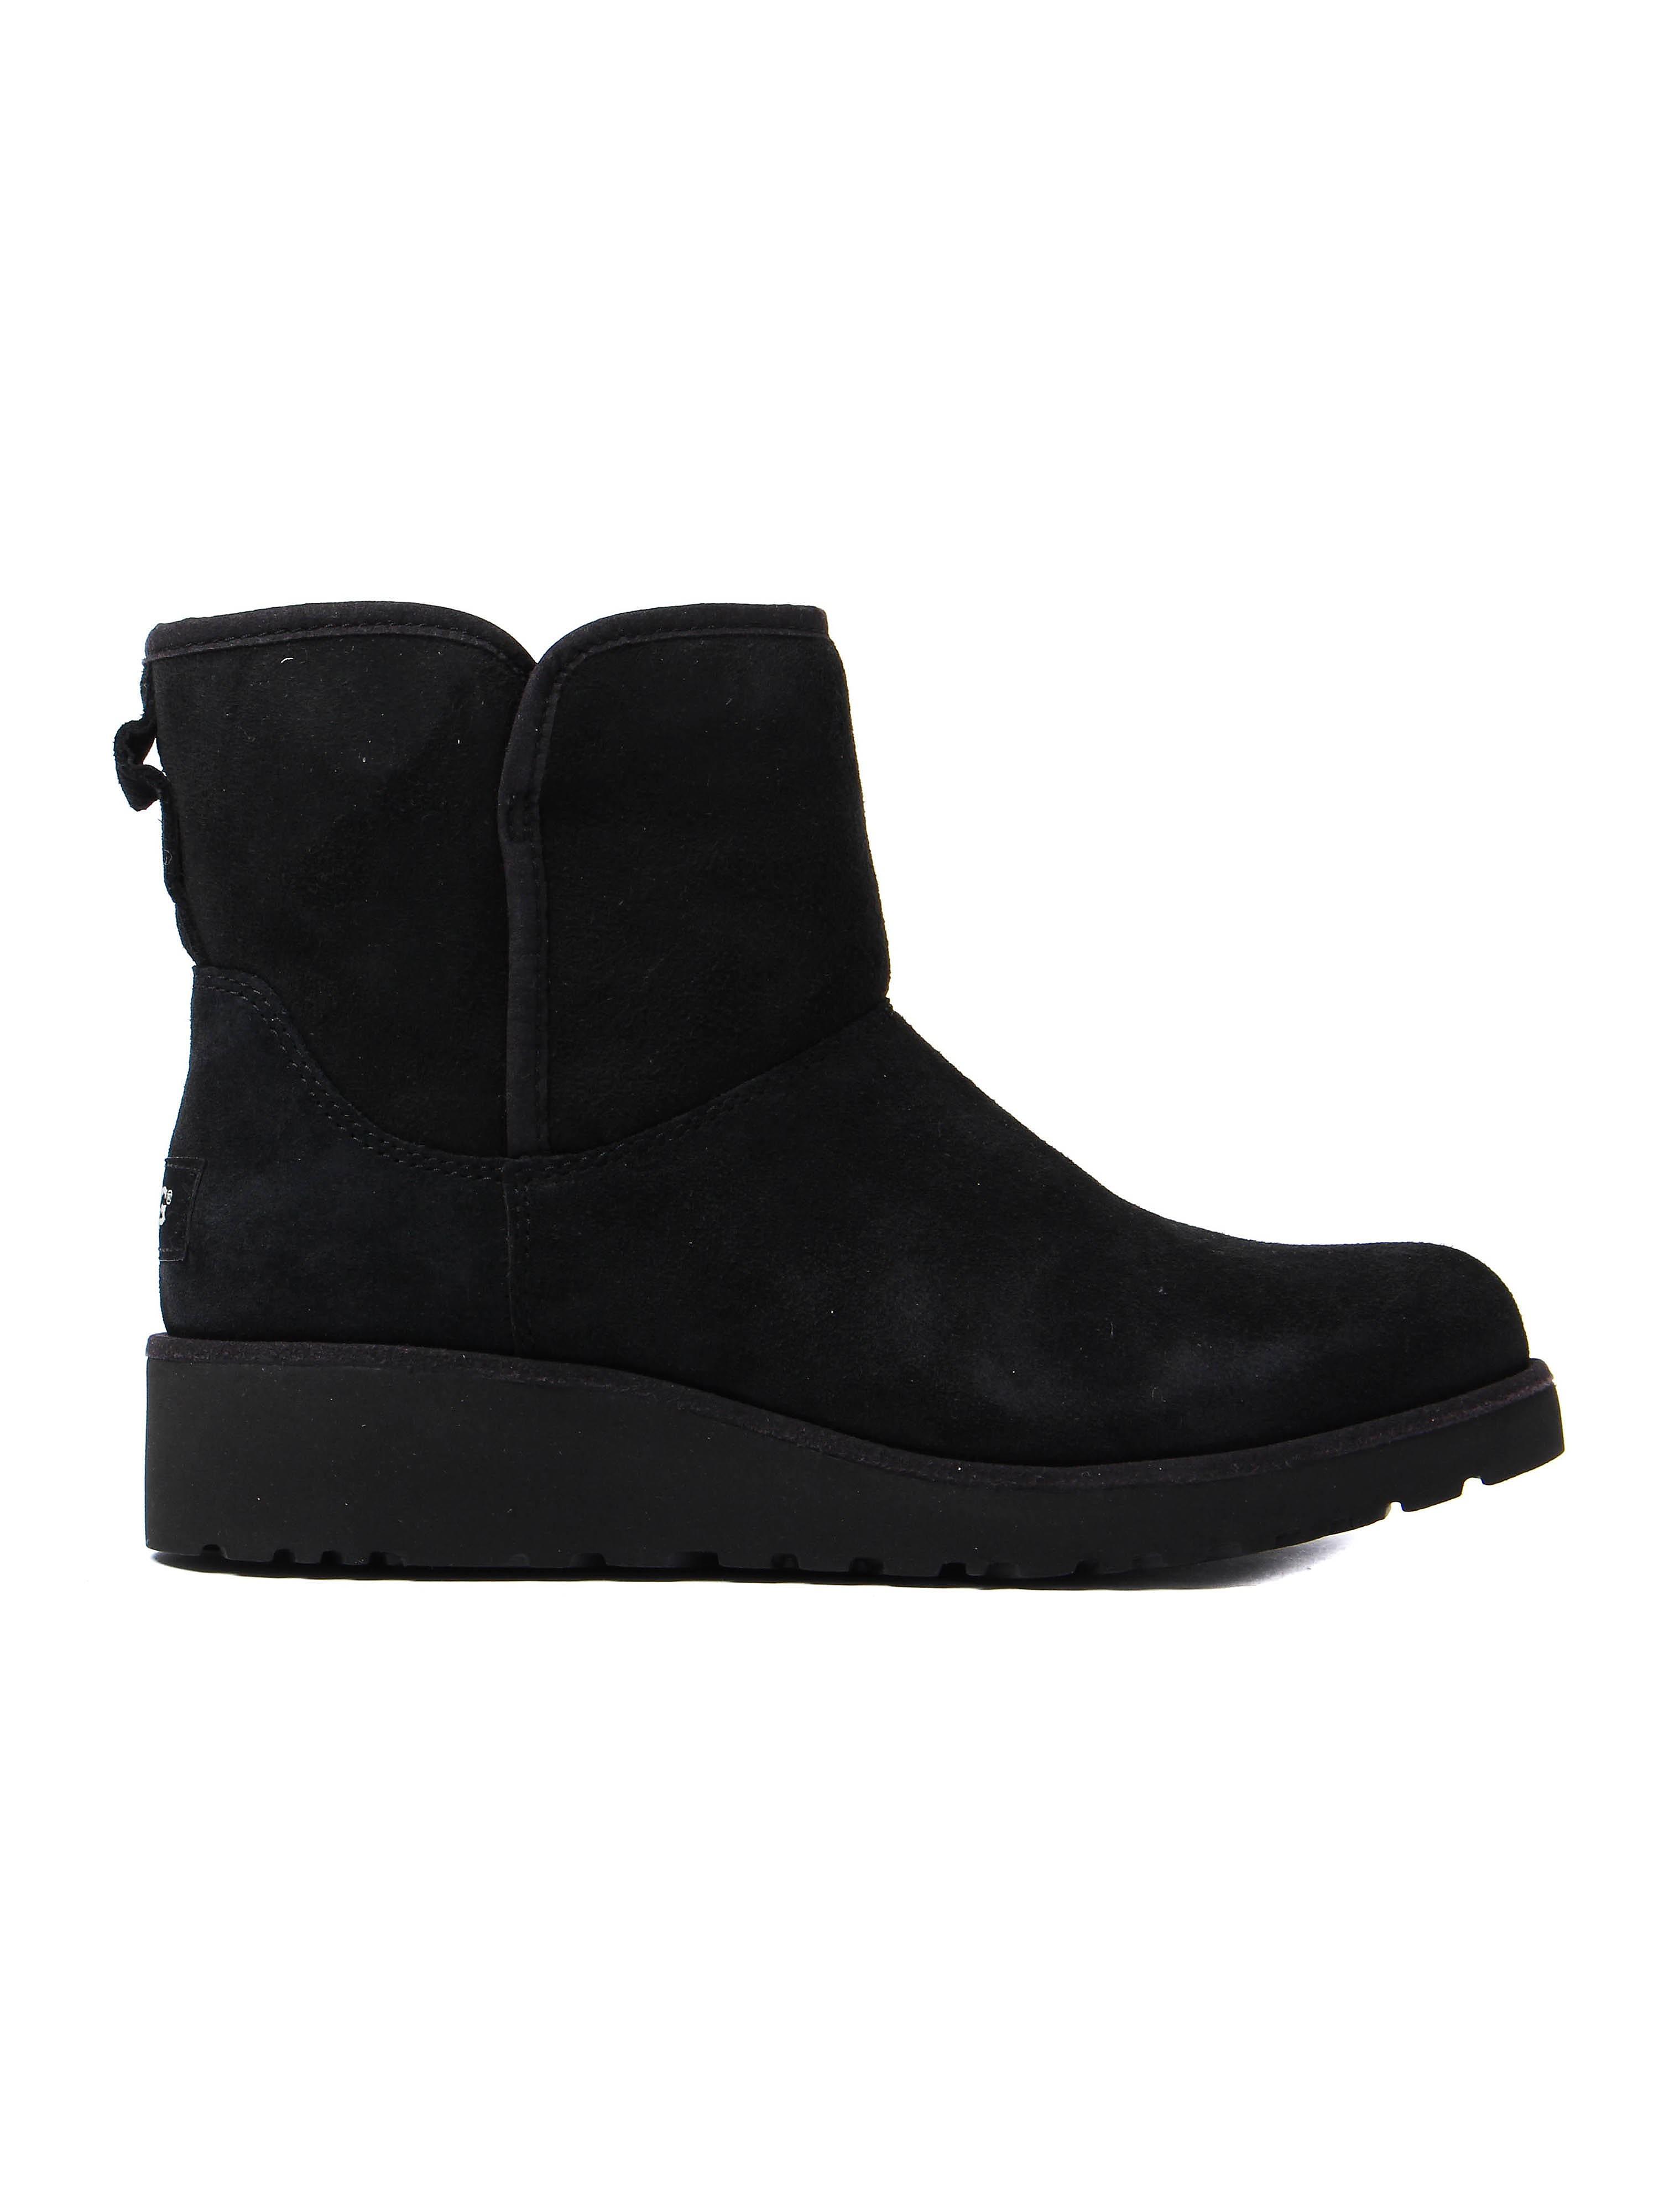 UGG Women's Kristin Boots - Black